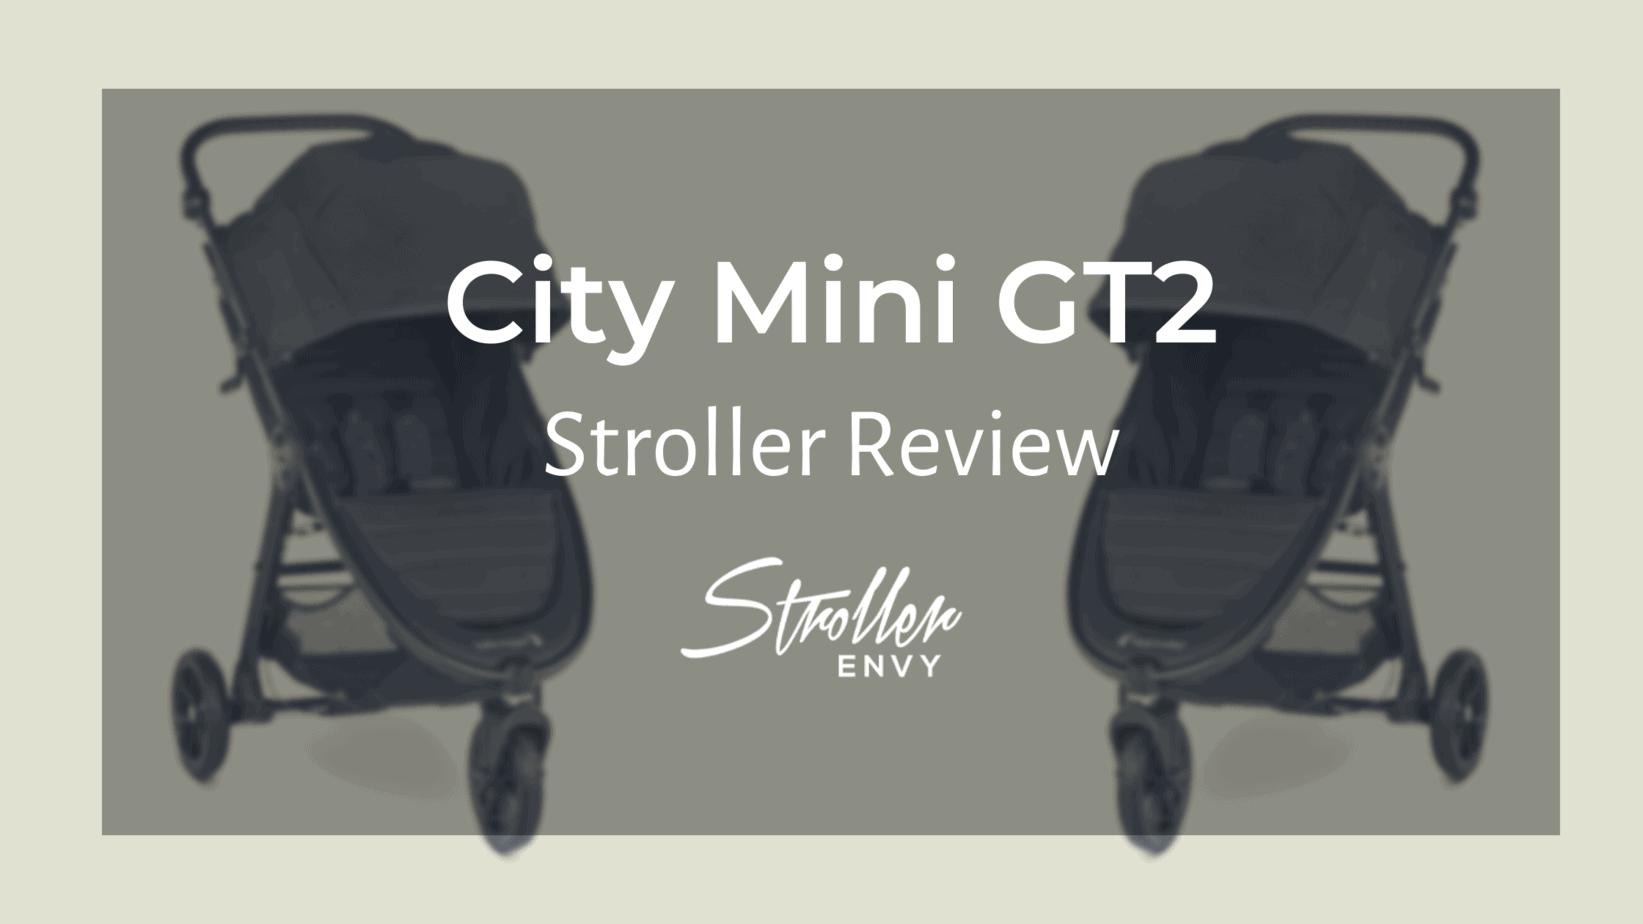 City Mini GT2